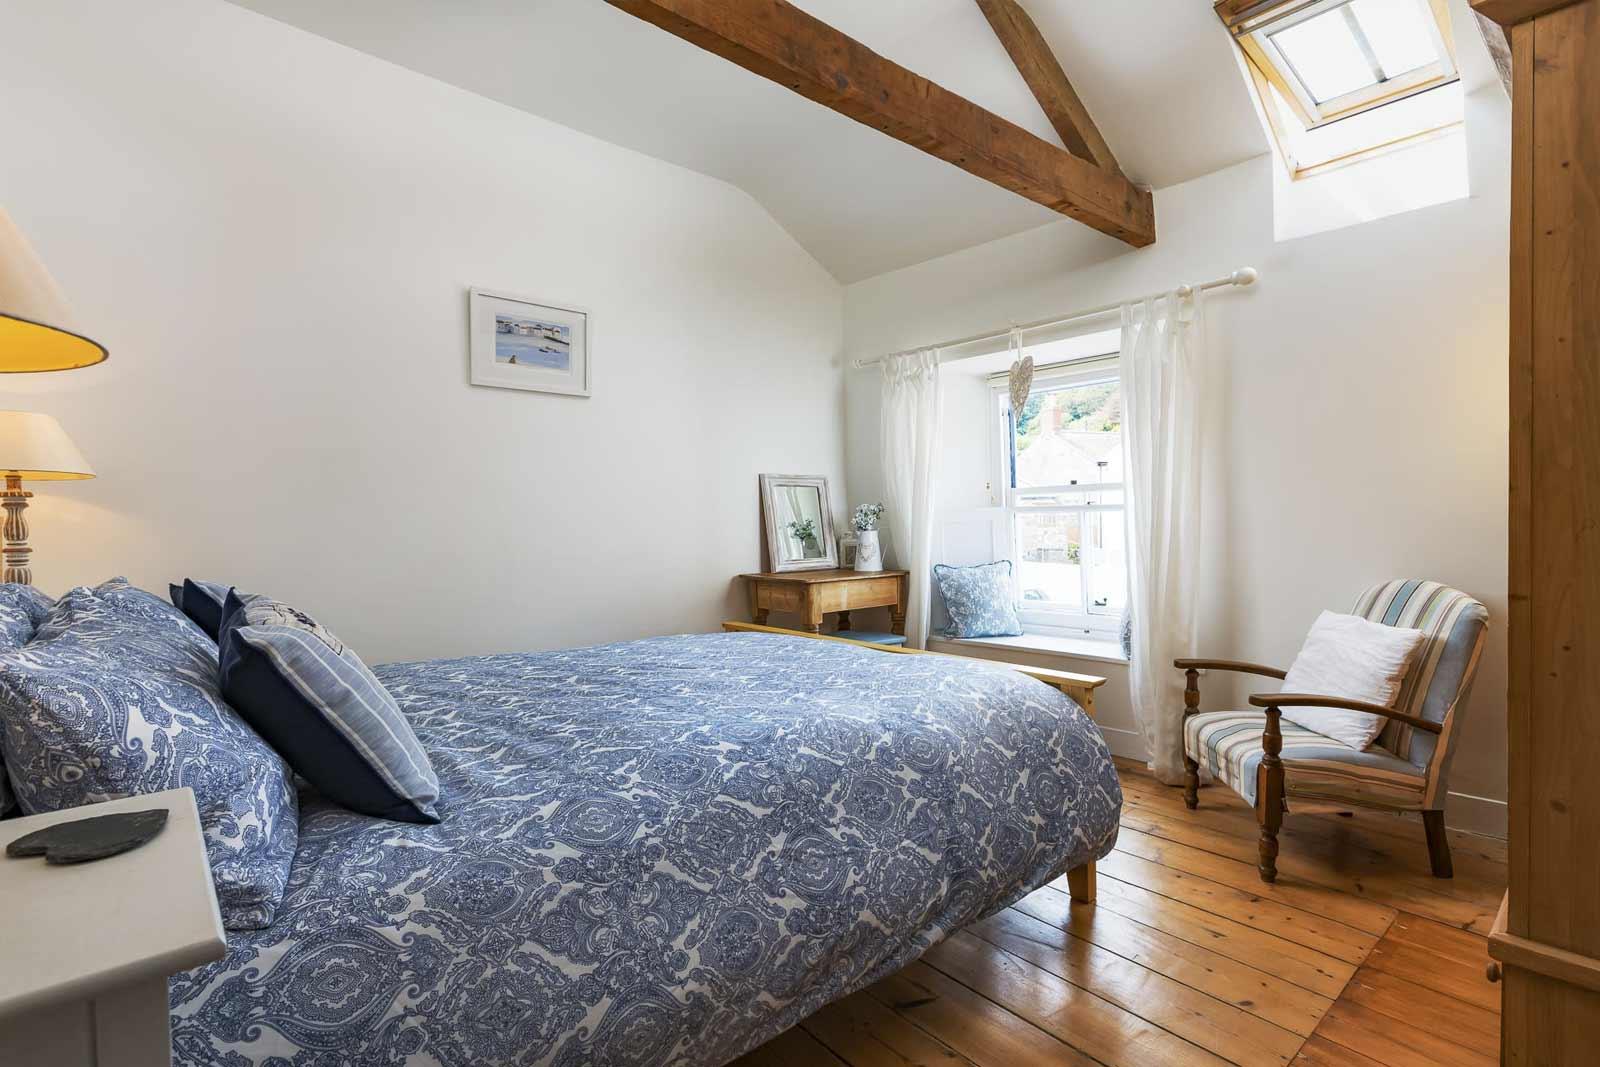 gulls-nest-master-bedroom-1